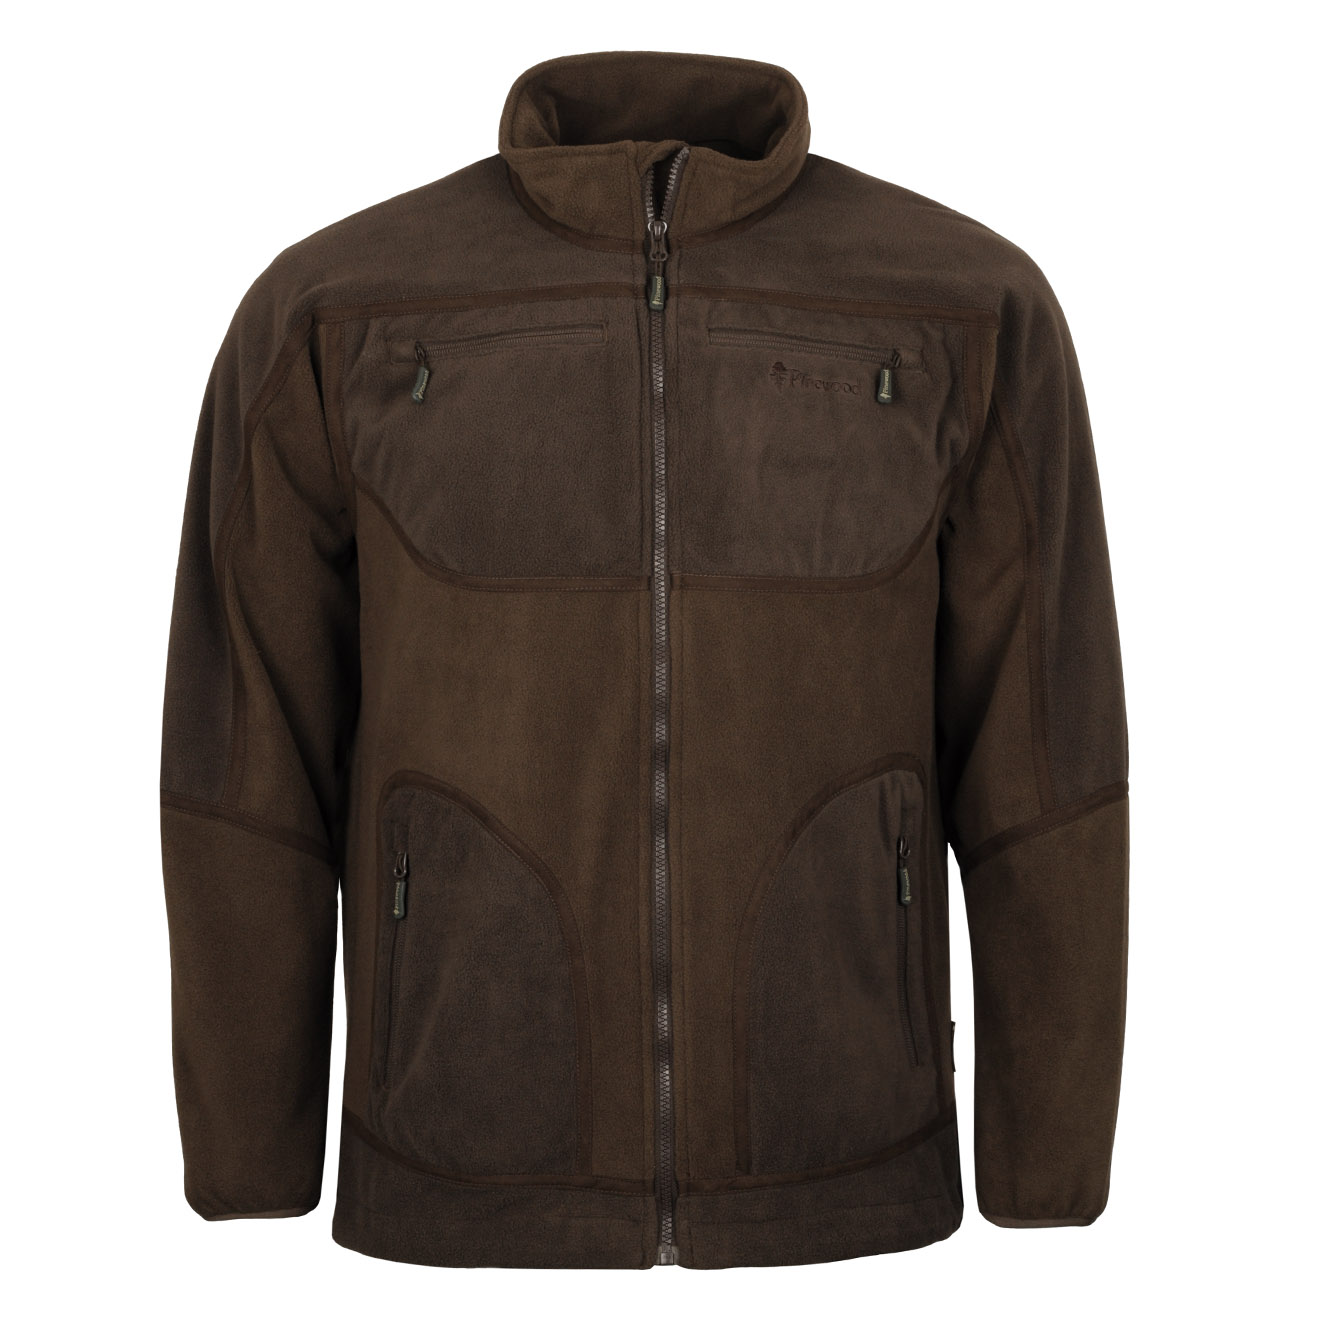 38b9056aa Pinewood Michigan Light Fleece Jacket Brown / Hunting Brown